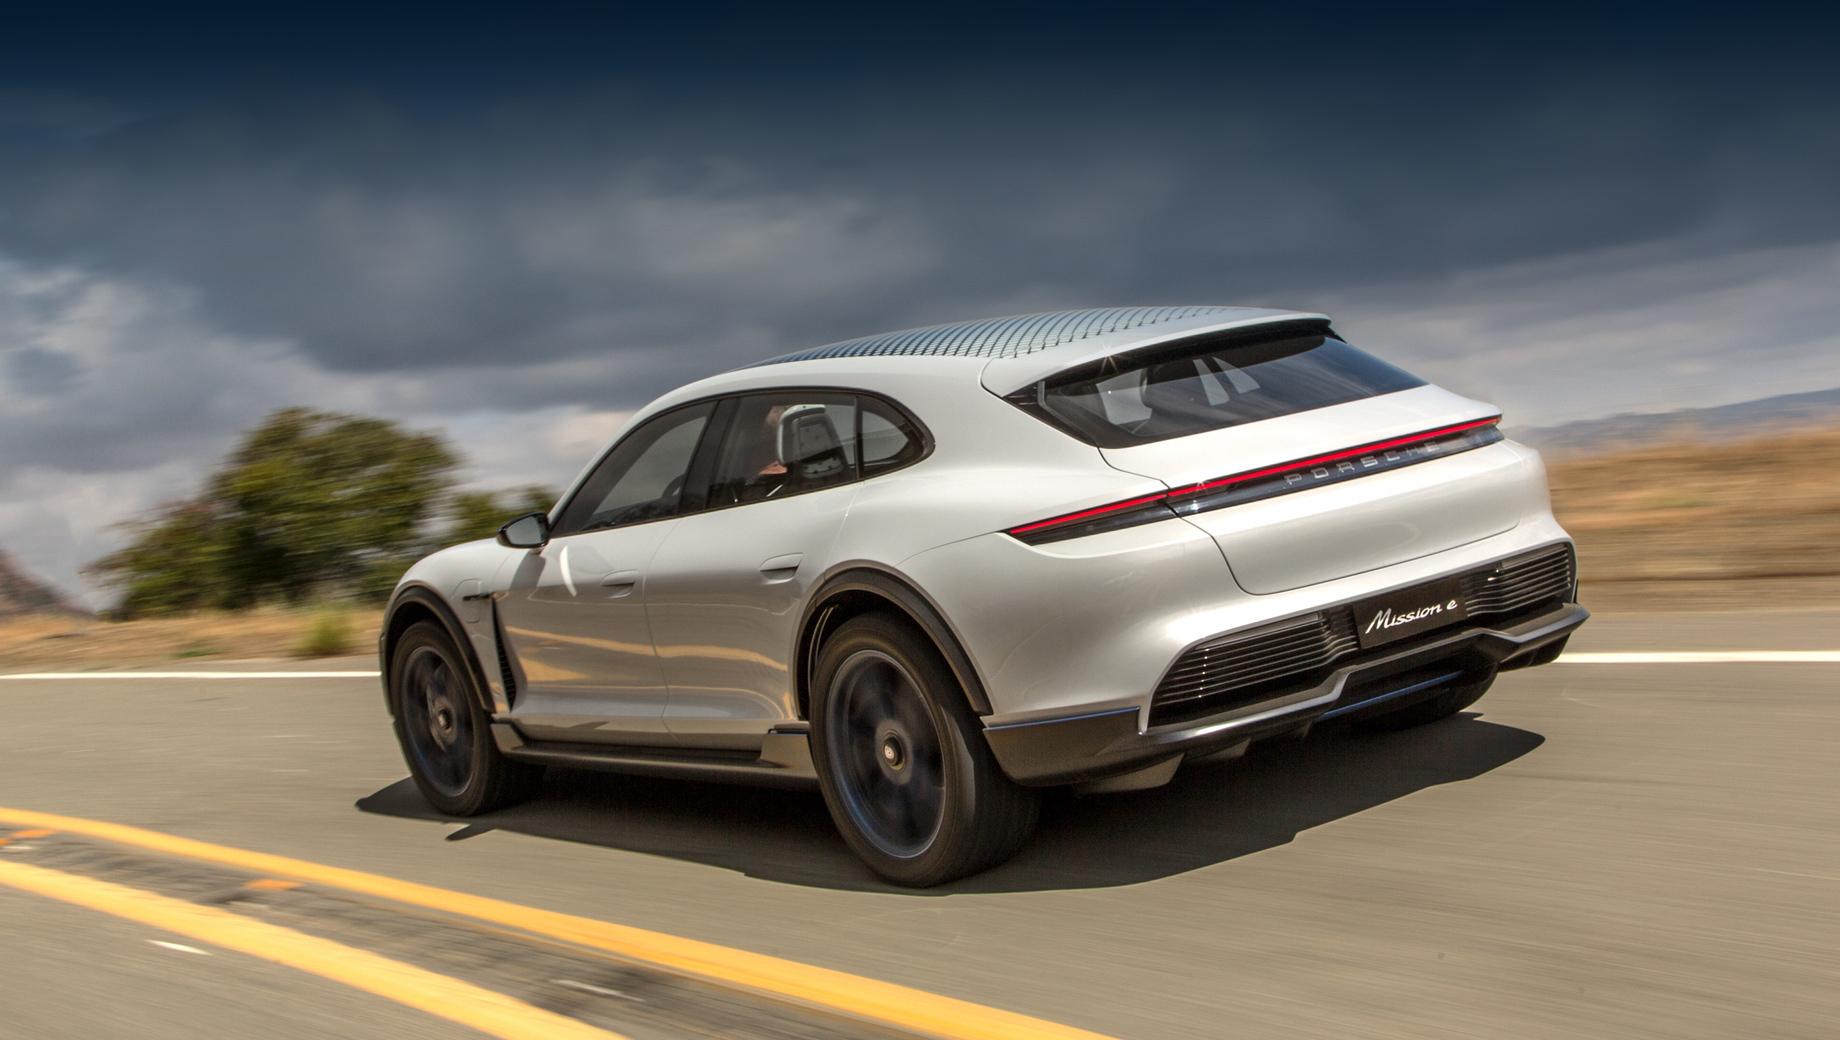 Porsche taycan,Porsche taycan cross turismo. Универсал должен подражать во внешности концепту Porsche Mission E Cross Turismo 2018 года.